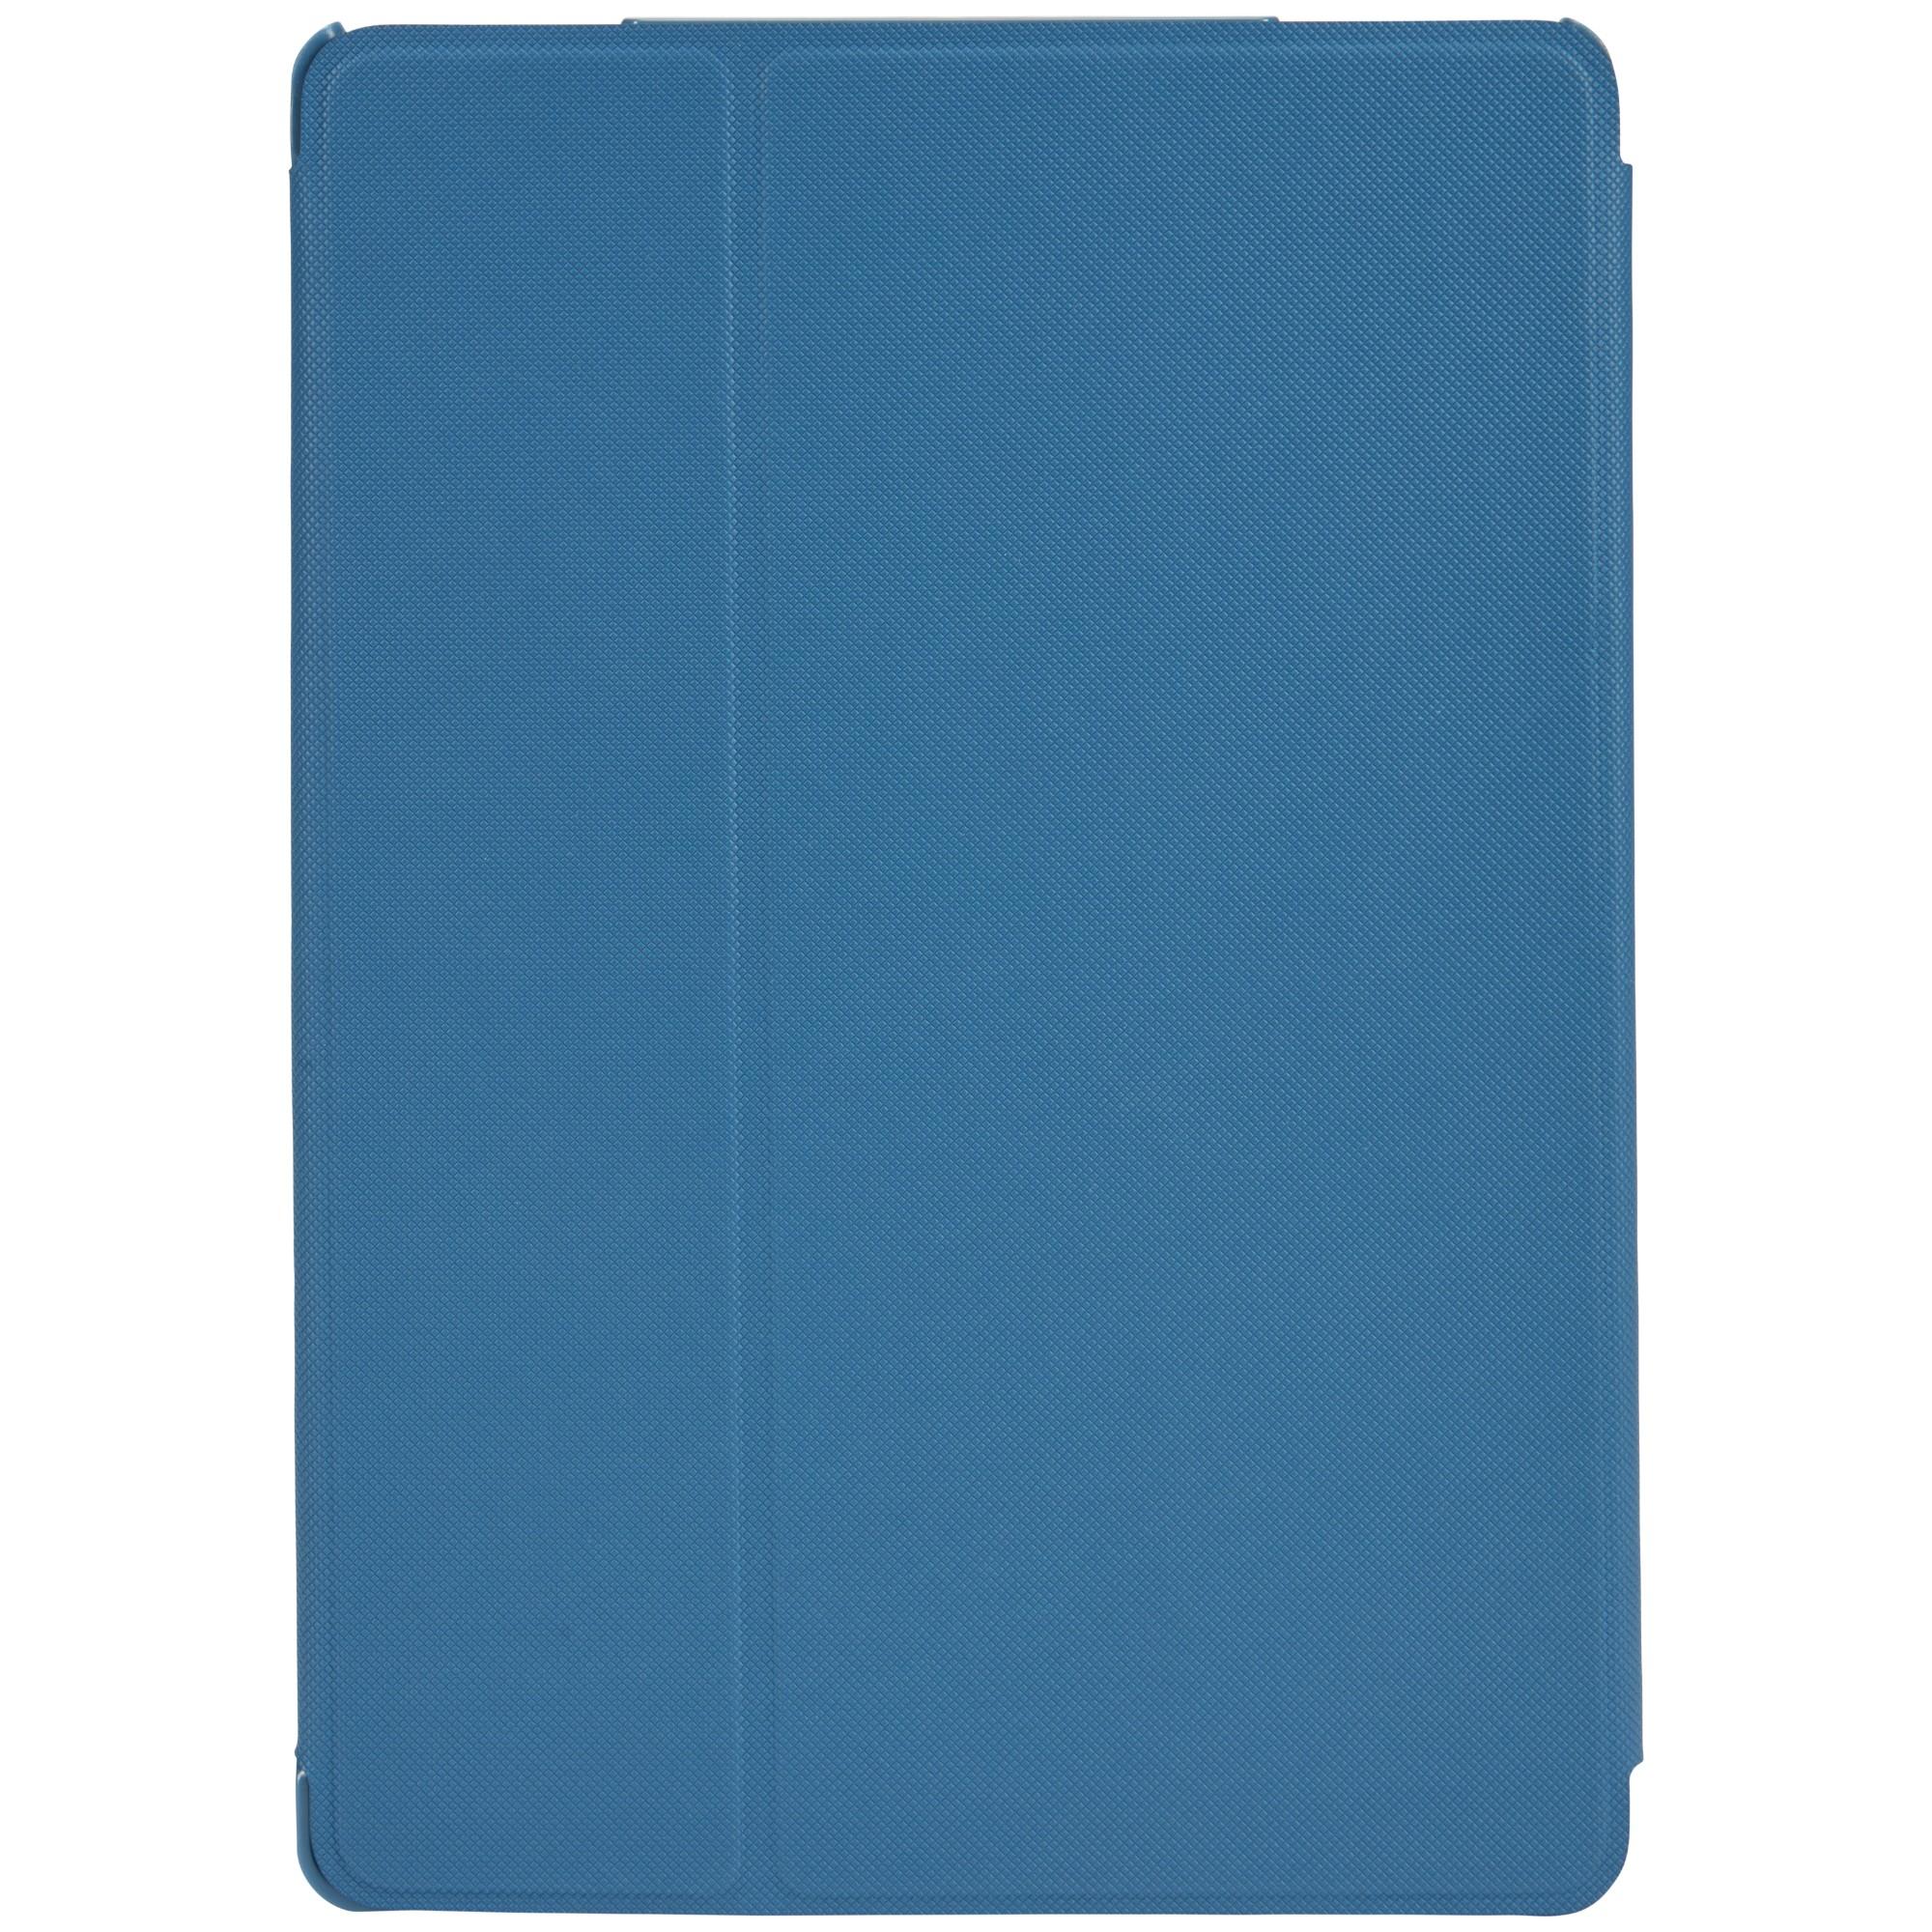 "Case Logic SnapView 2.0 26.7 cm (10.5"") Folio Blue"